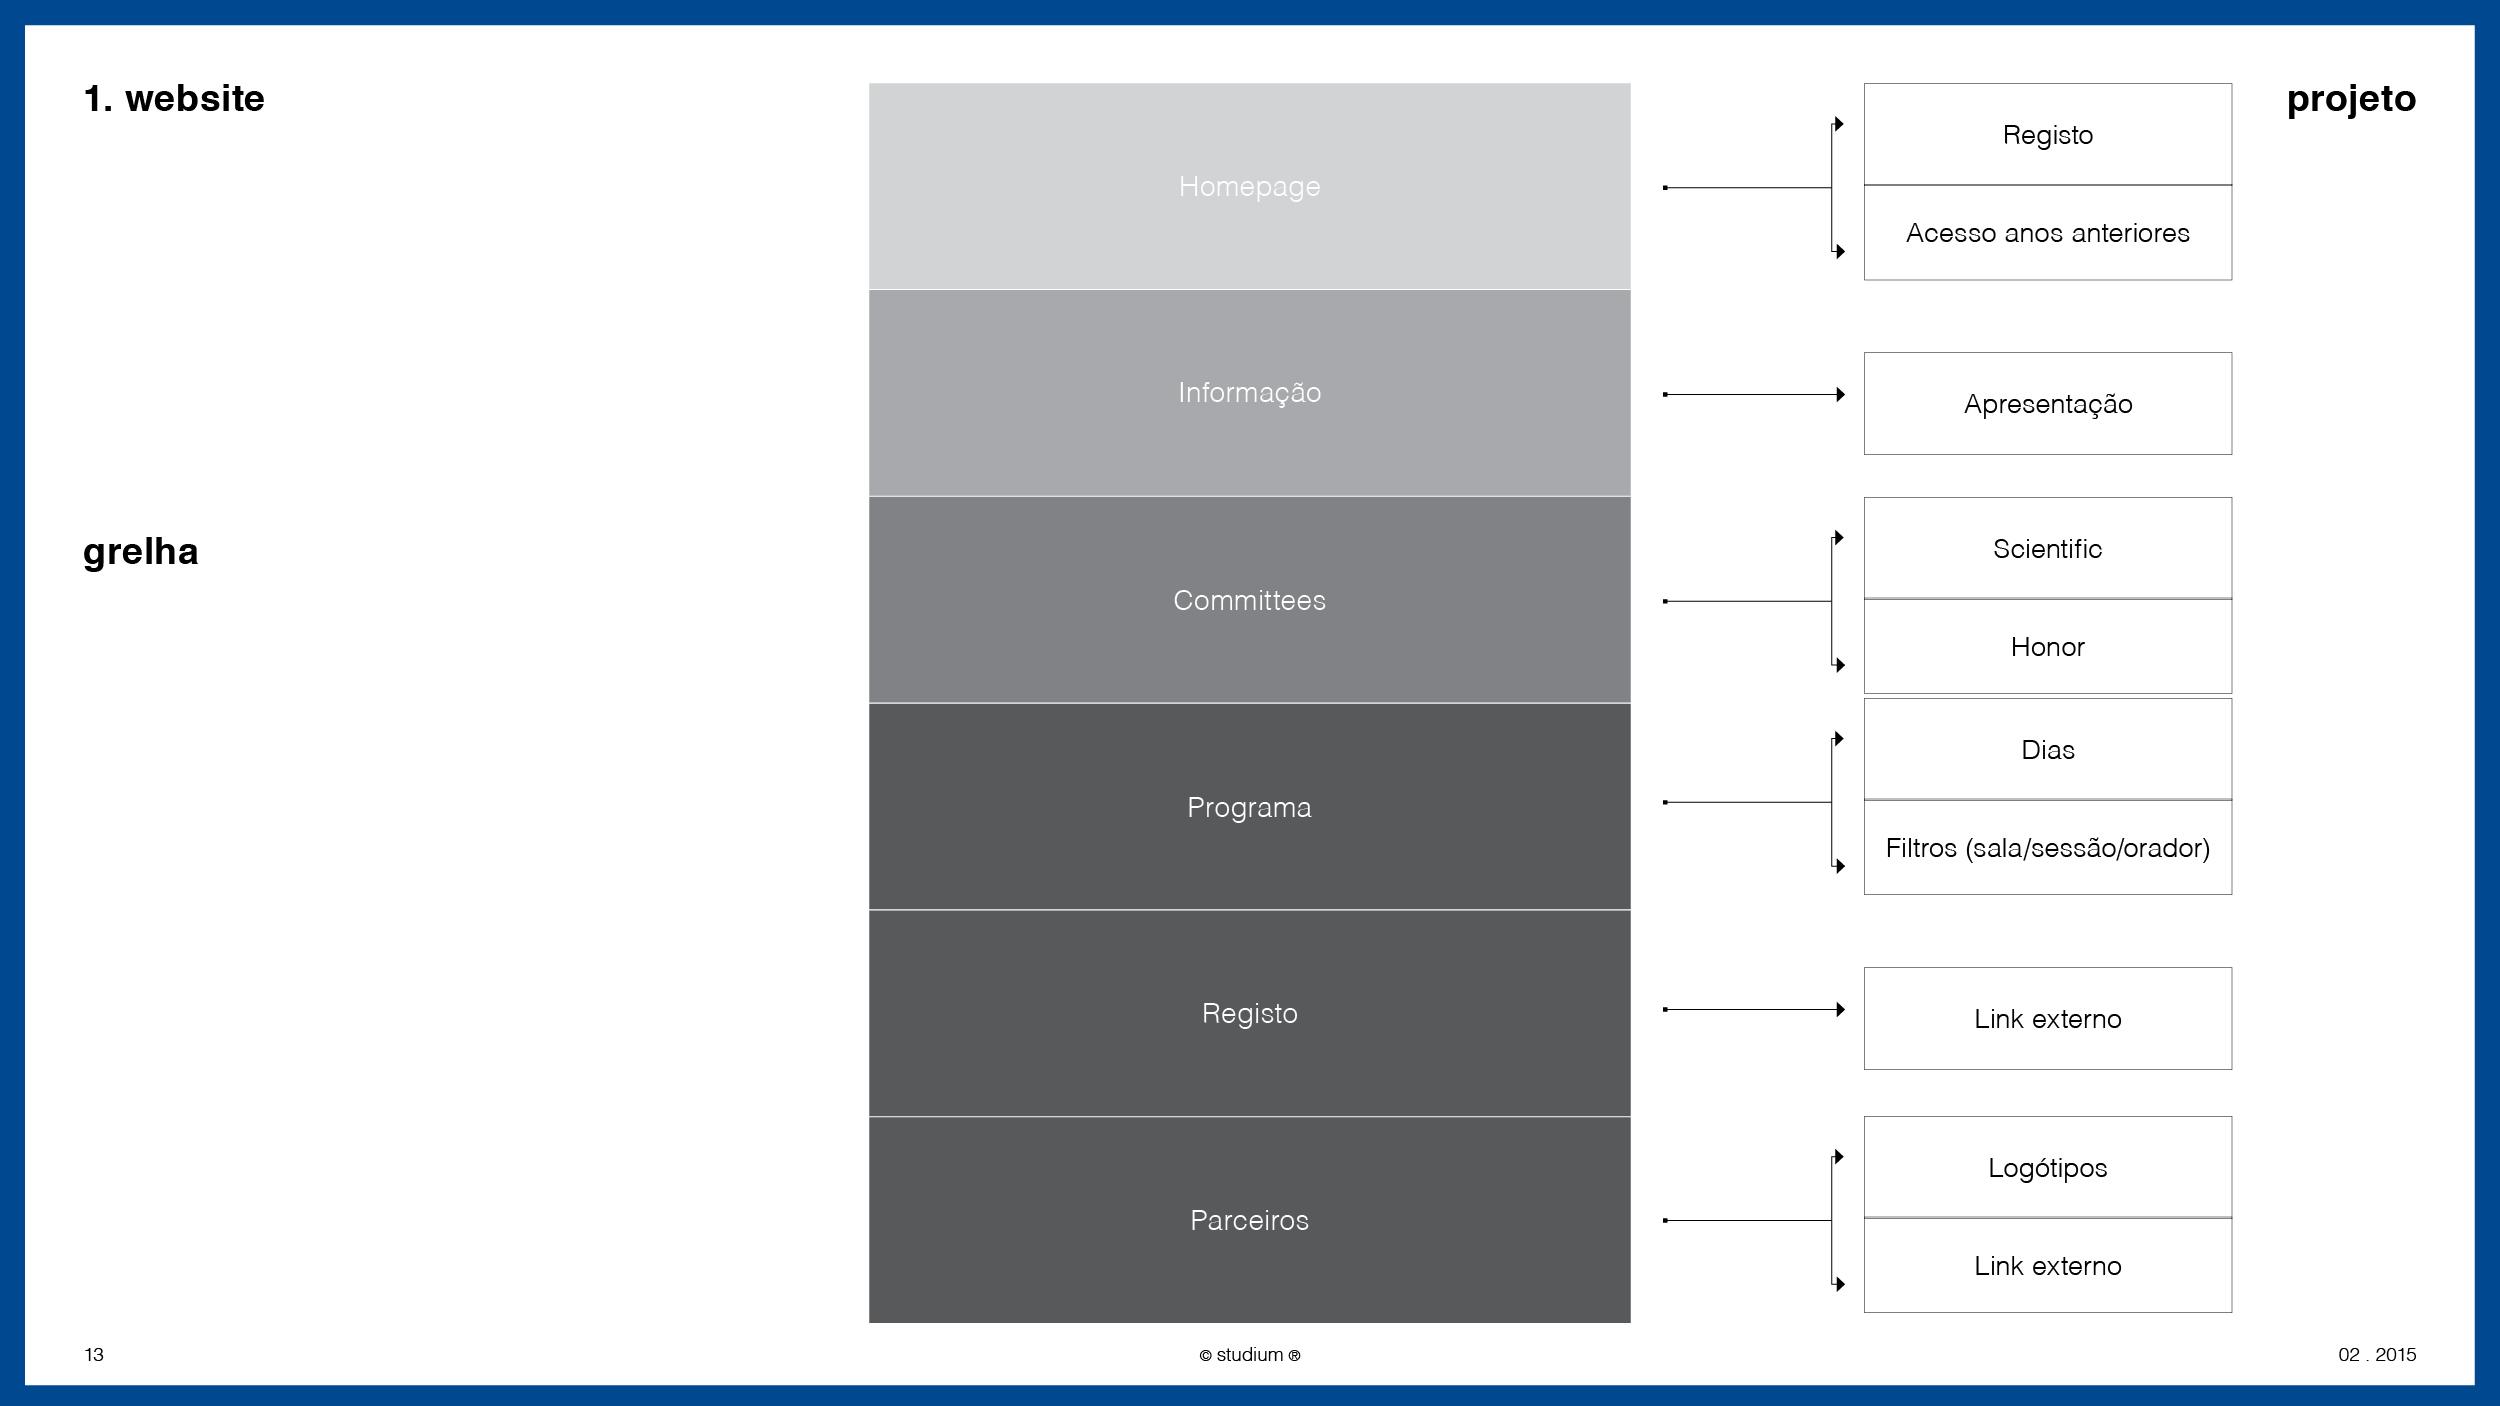 WEB20150000-PVC-Website-Presentation-AC-13